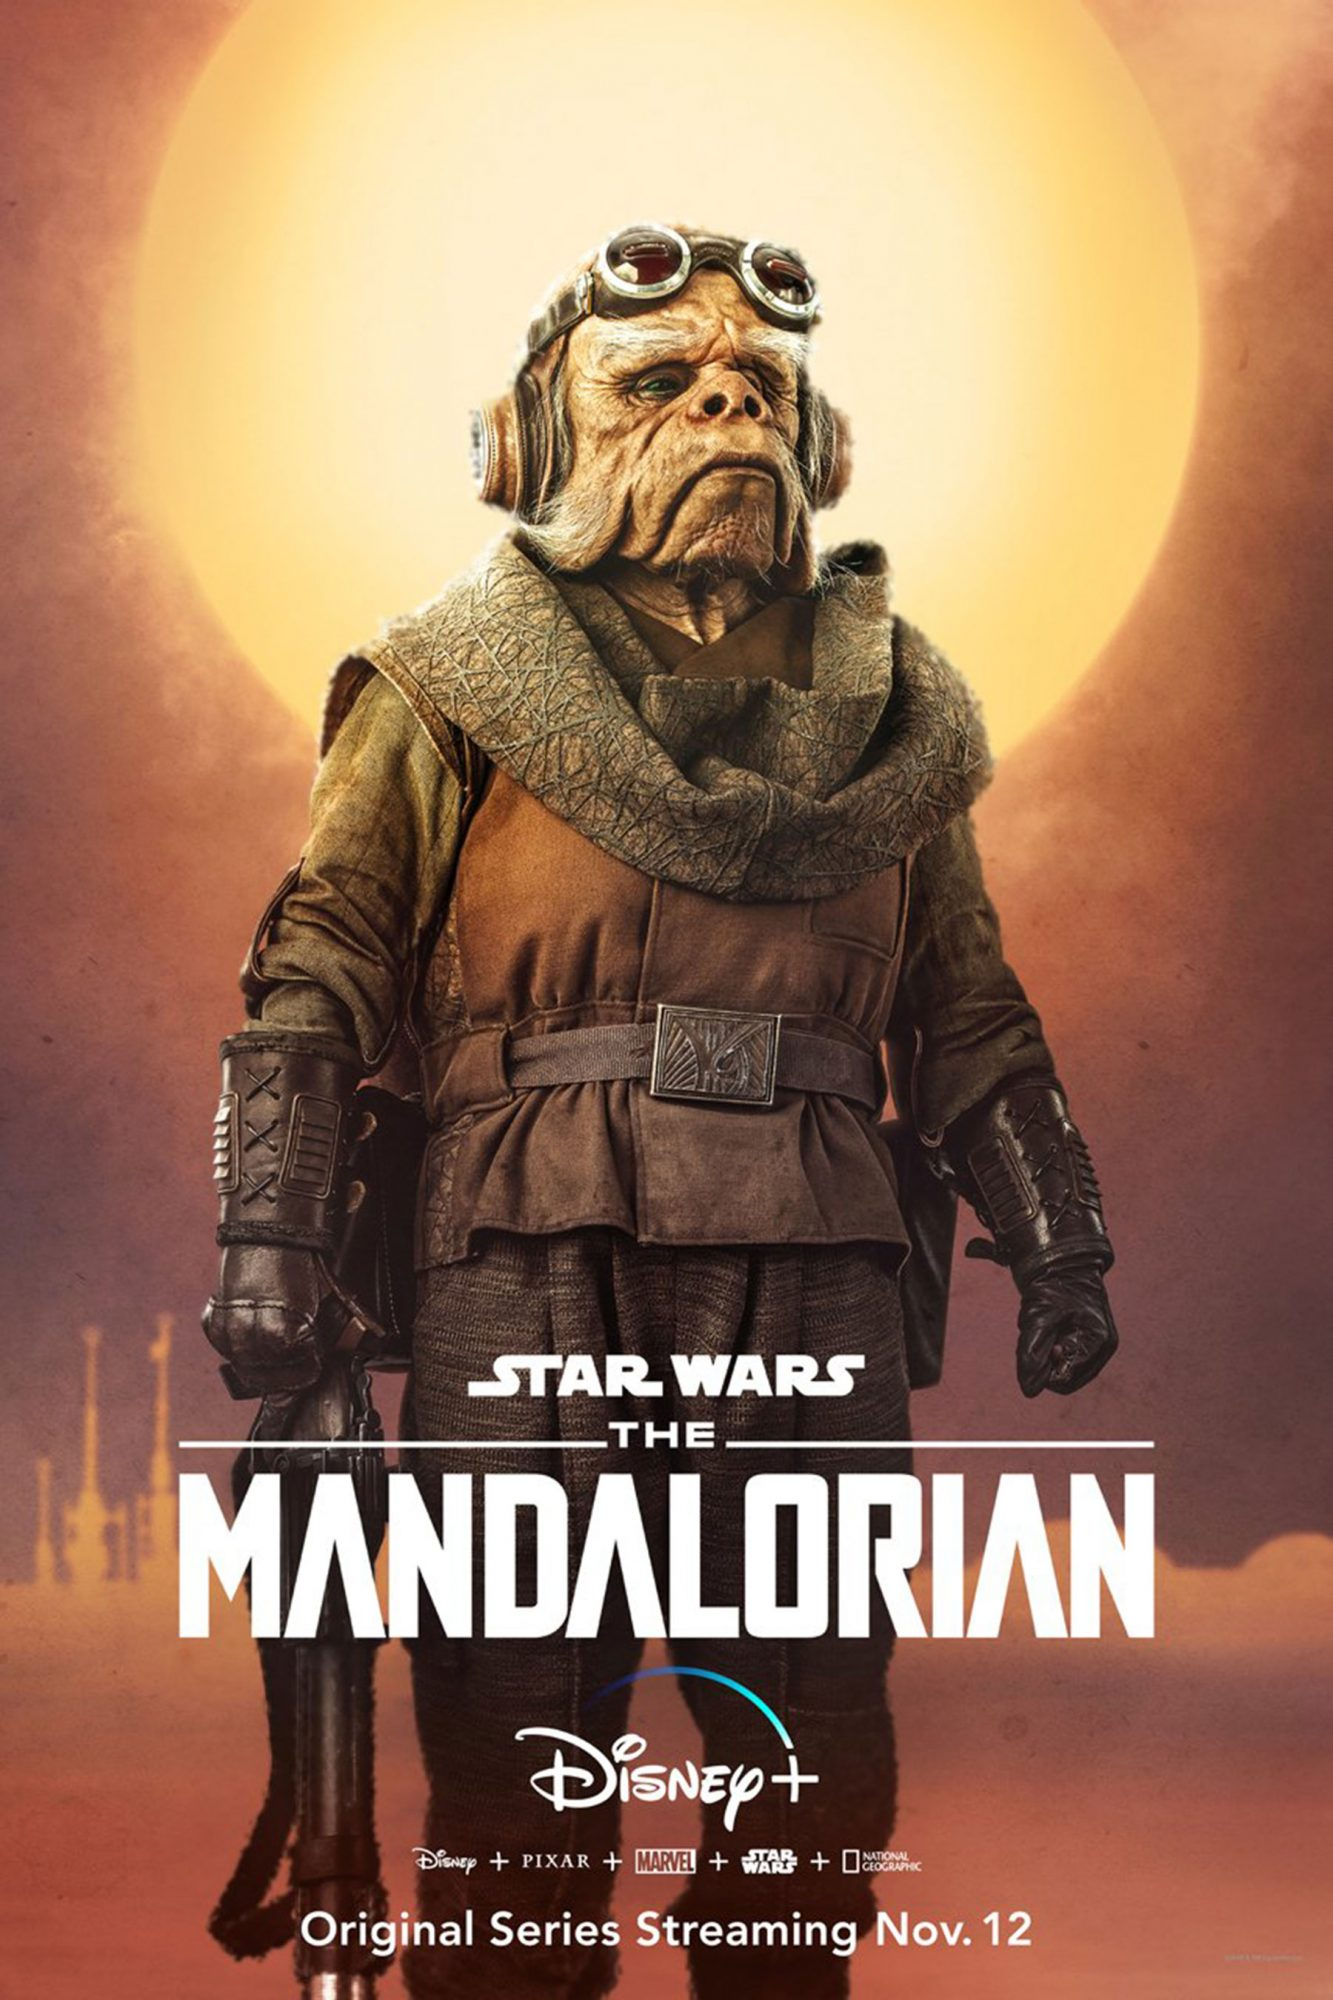 The Mandalorian character poster